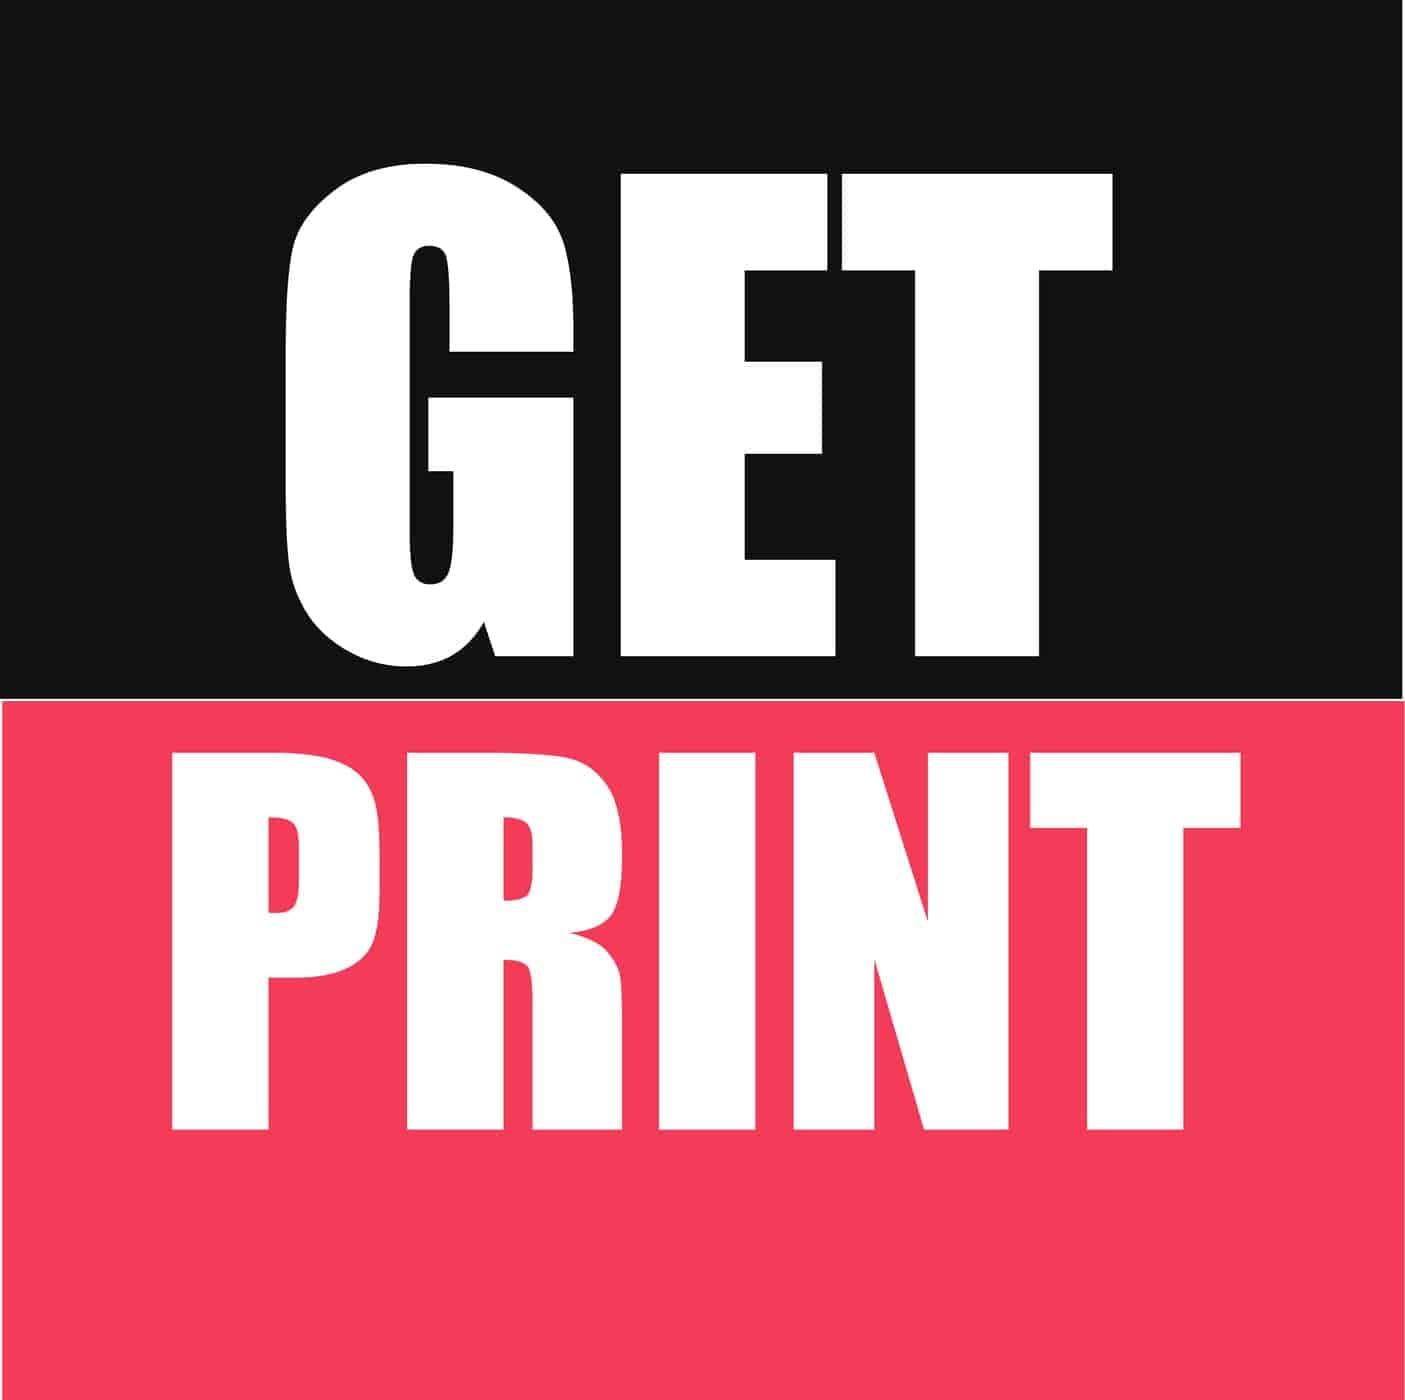 גט-פרינט דפוס מצוין לעסקים Get Print